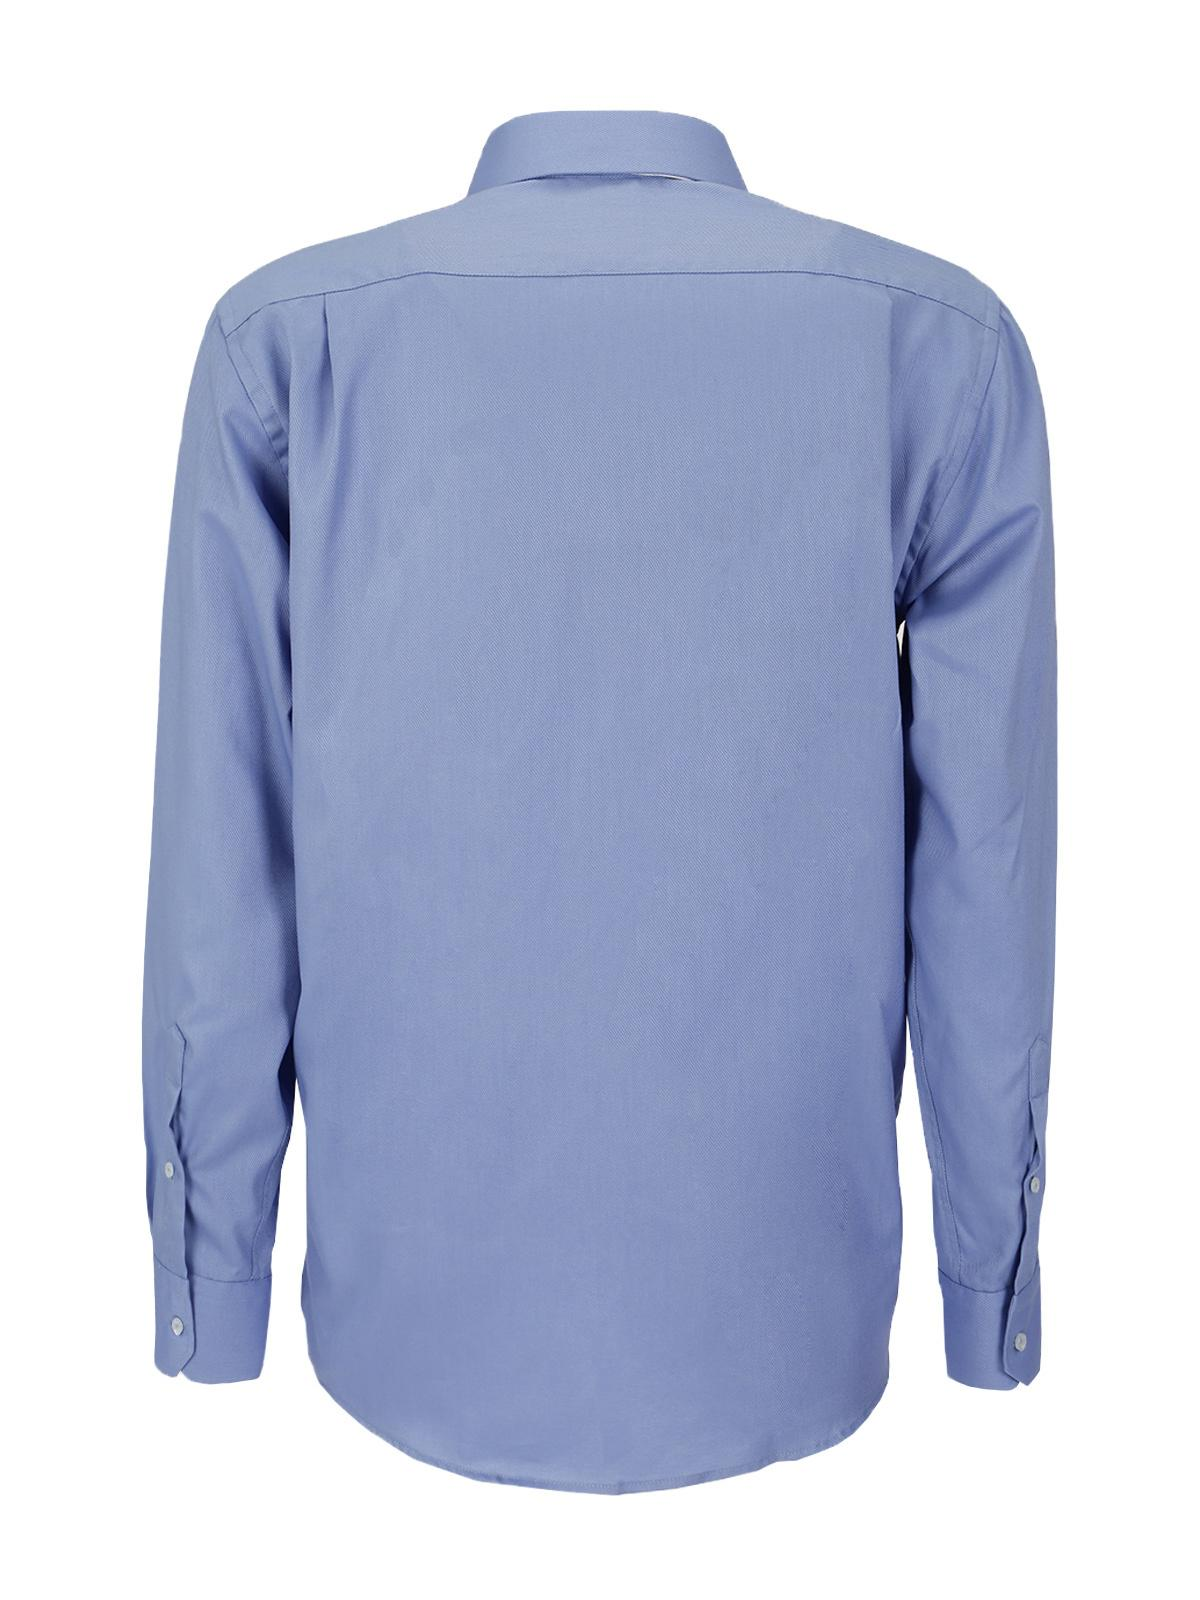 4c28cea665 Camicia manica lunga uomo sartoriale firenze | MecShopping